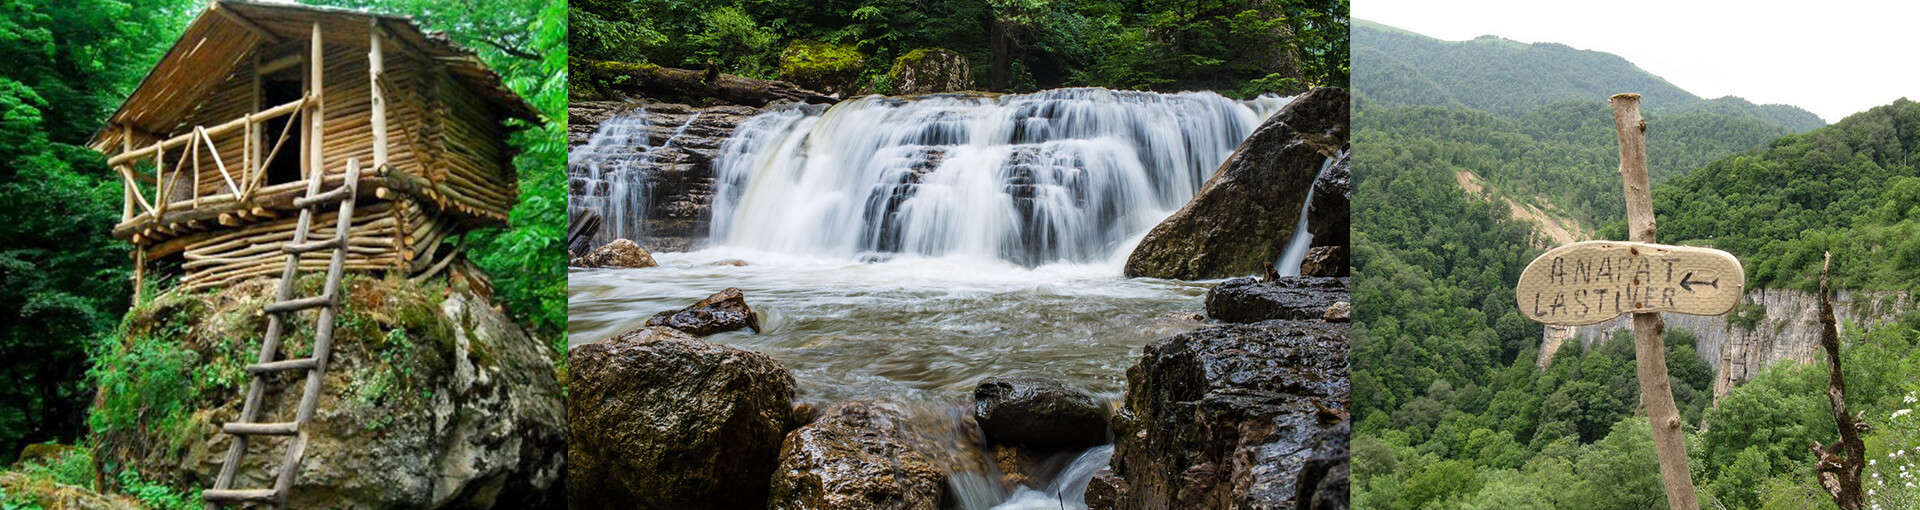 Lastiver-the hidden wonder of nature